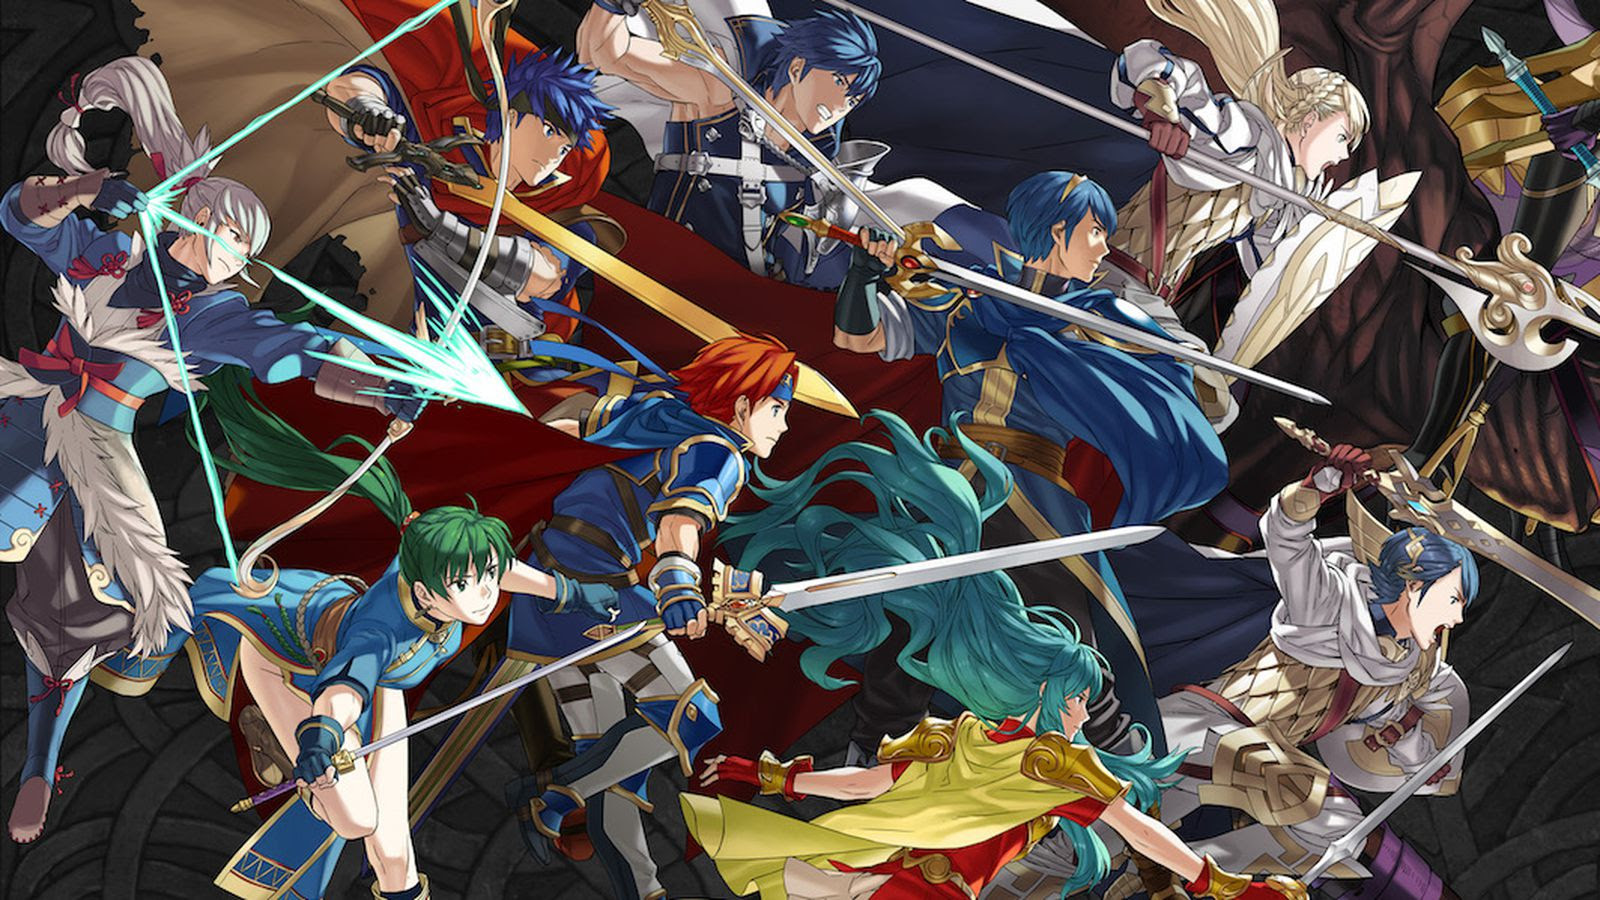 Famitsu reveals major details for Fire Emblem Warriors, confirms games included screenshot